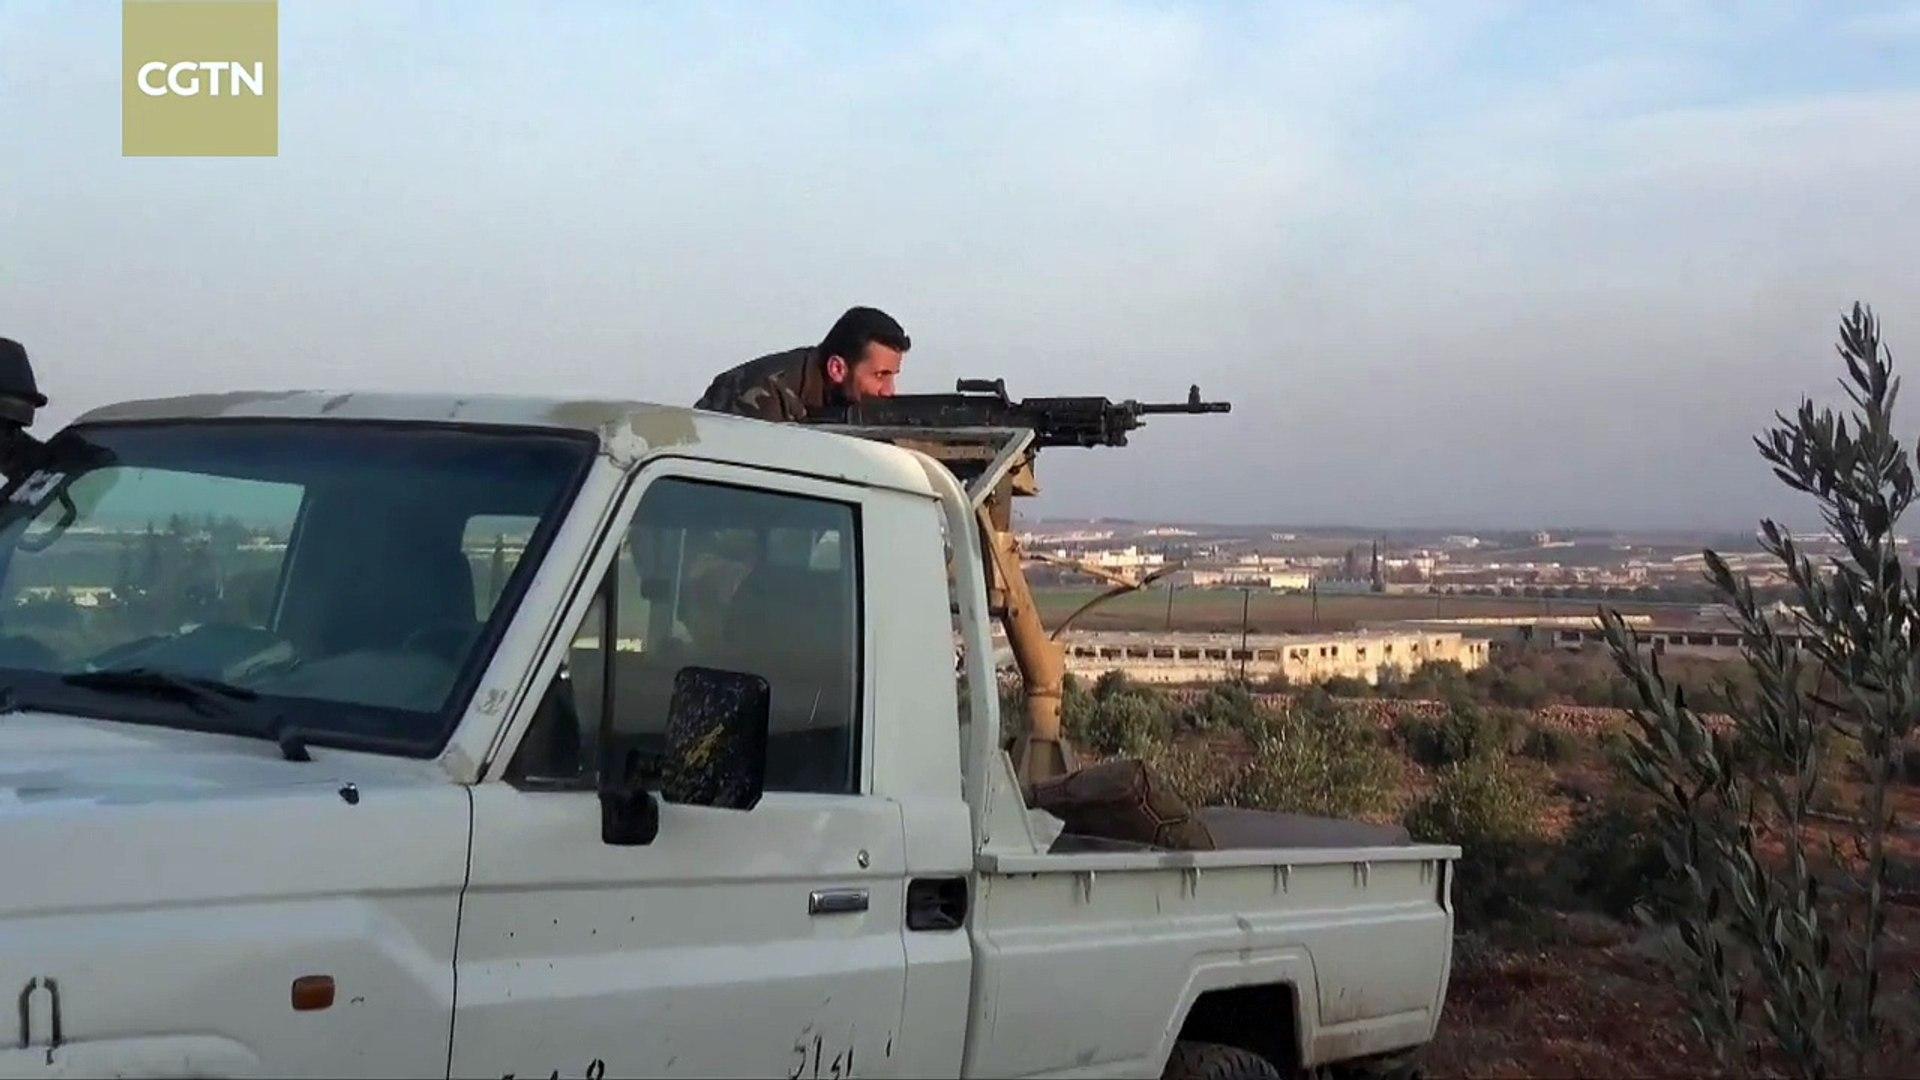 Turkey-backed Syrian rebels continue to battle ISIL near al-Bab